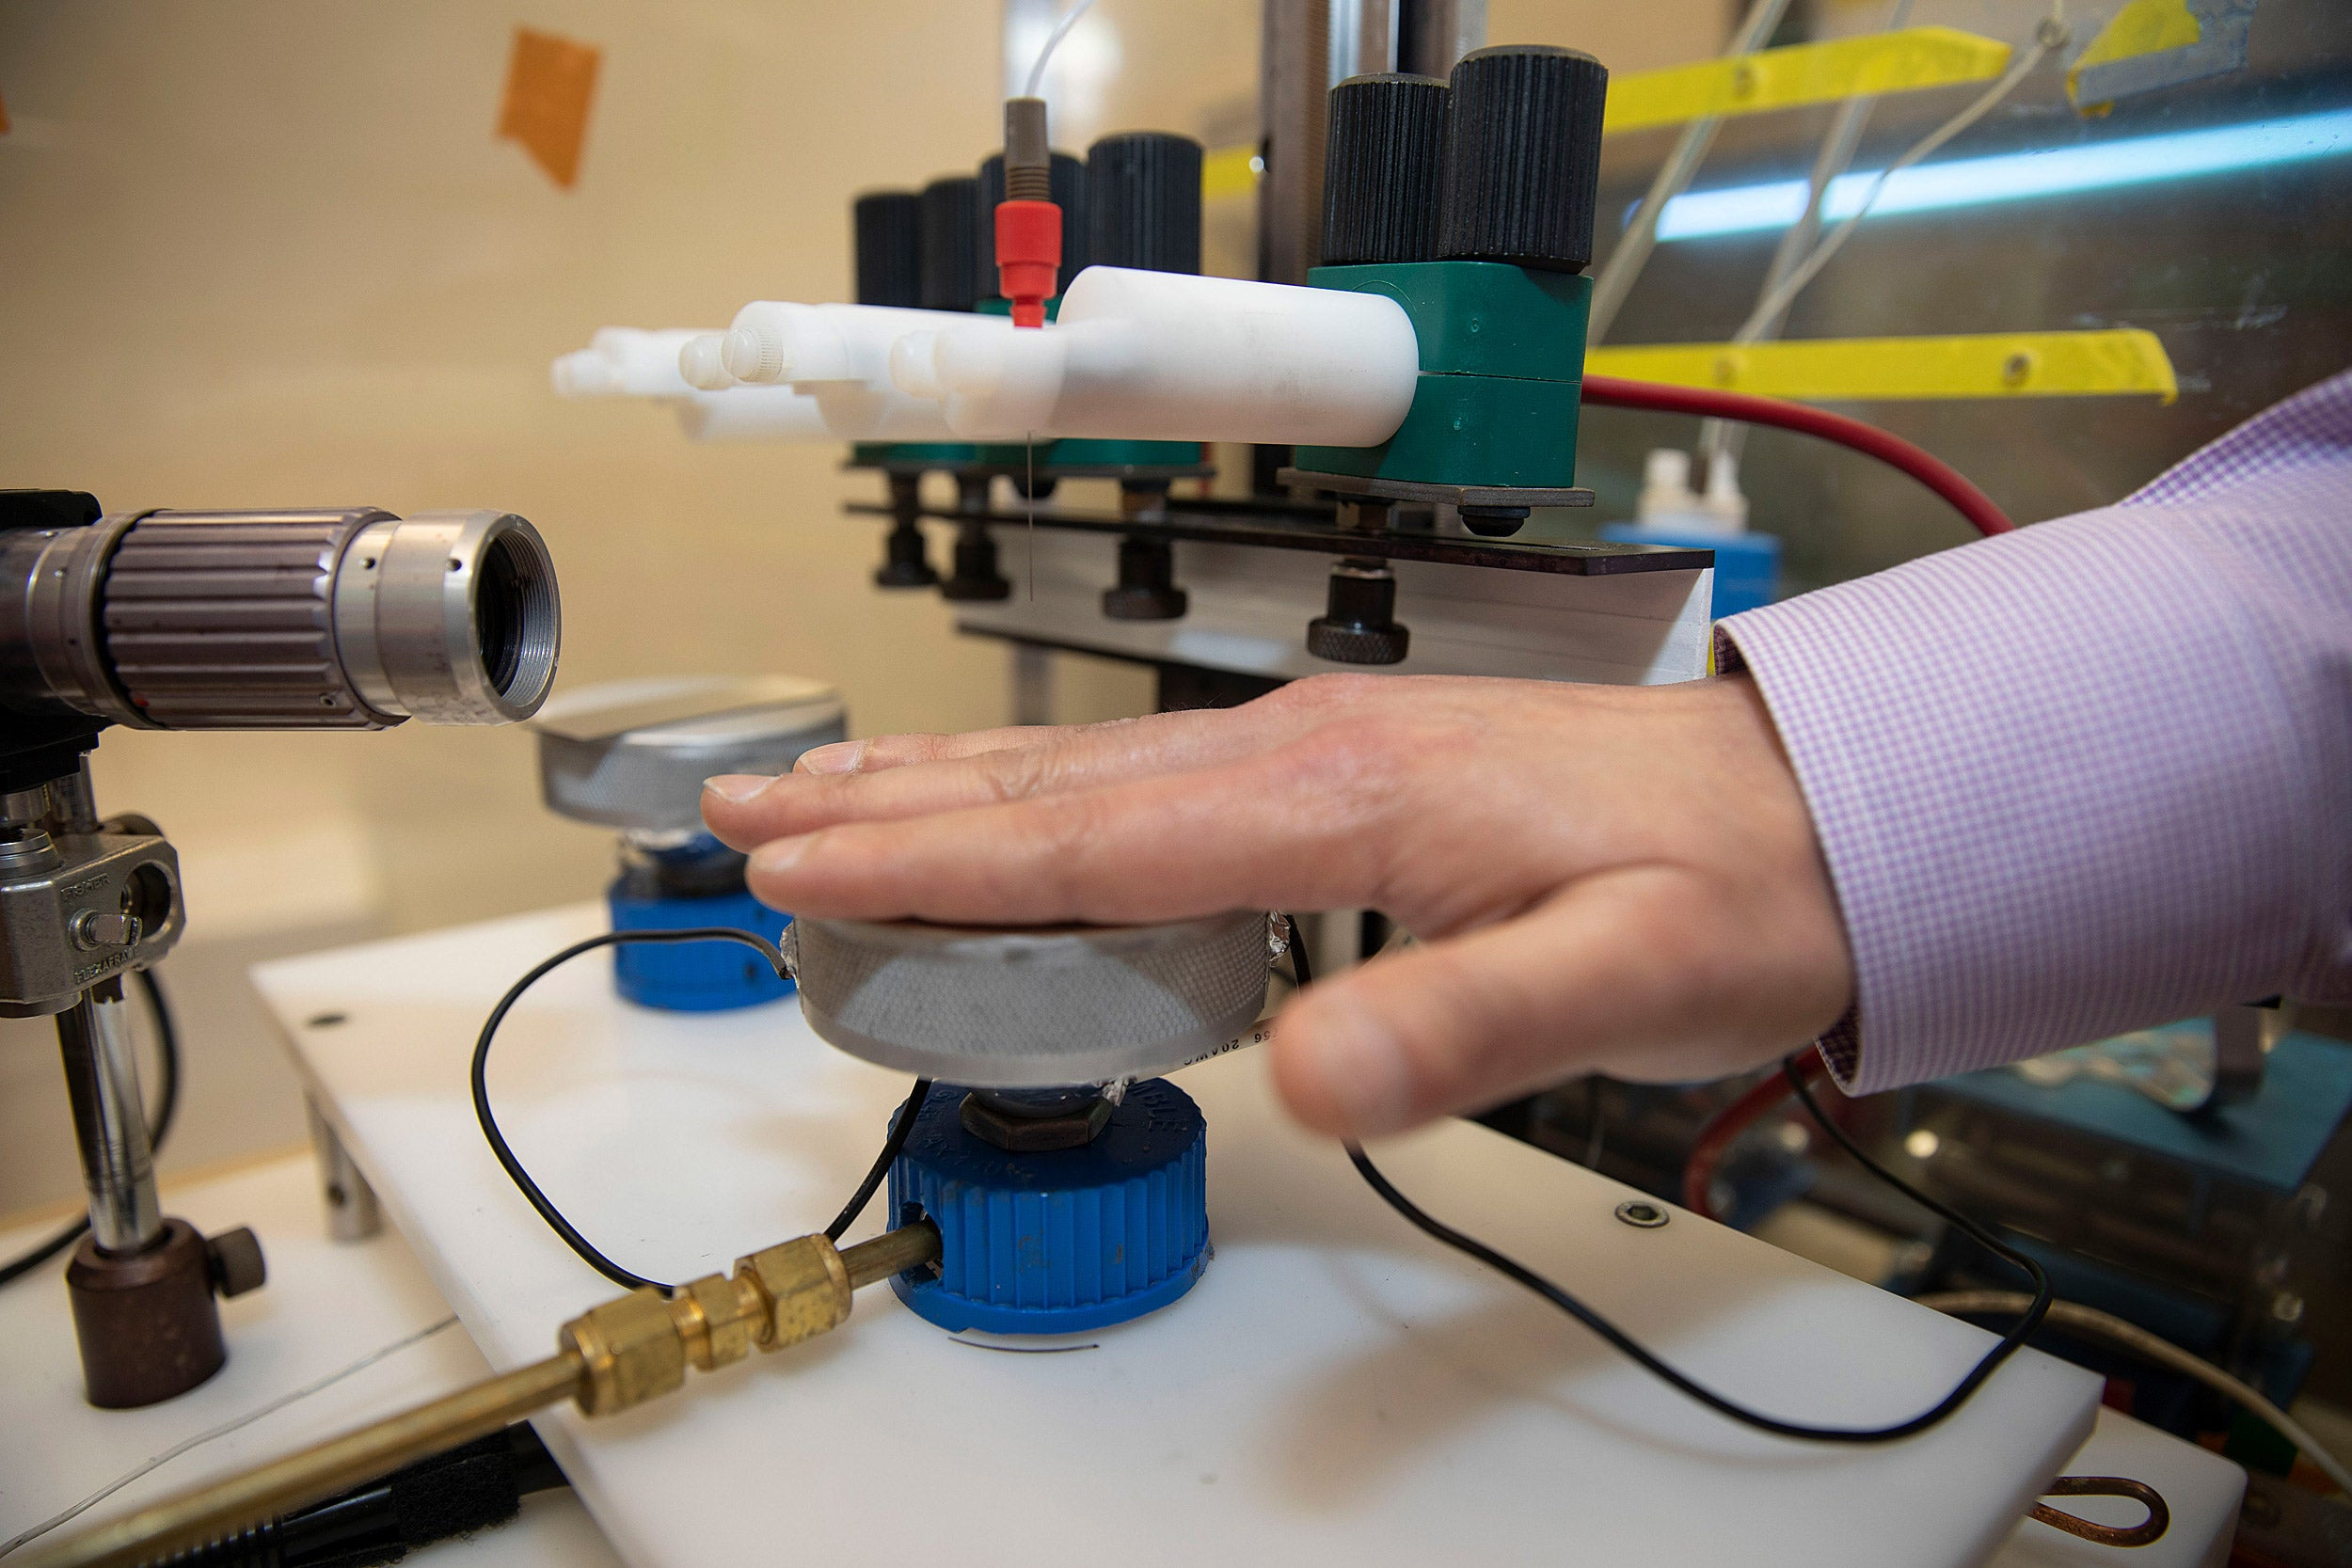 Nano-enabled platform to clean hands.